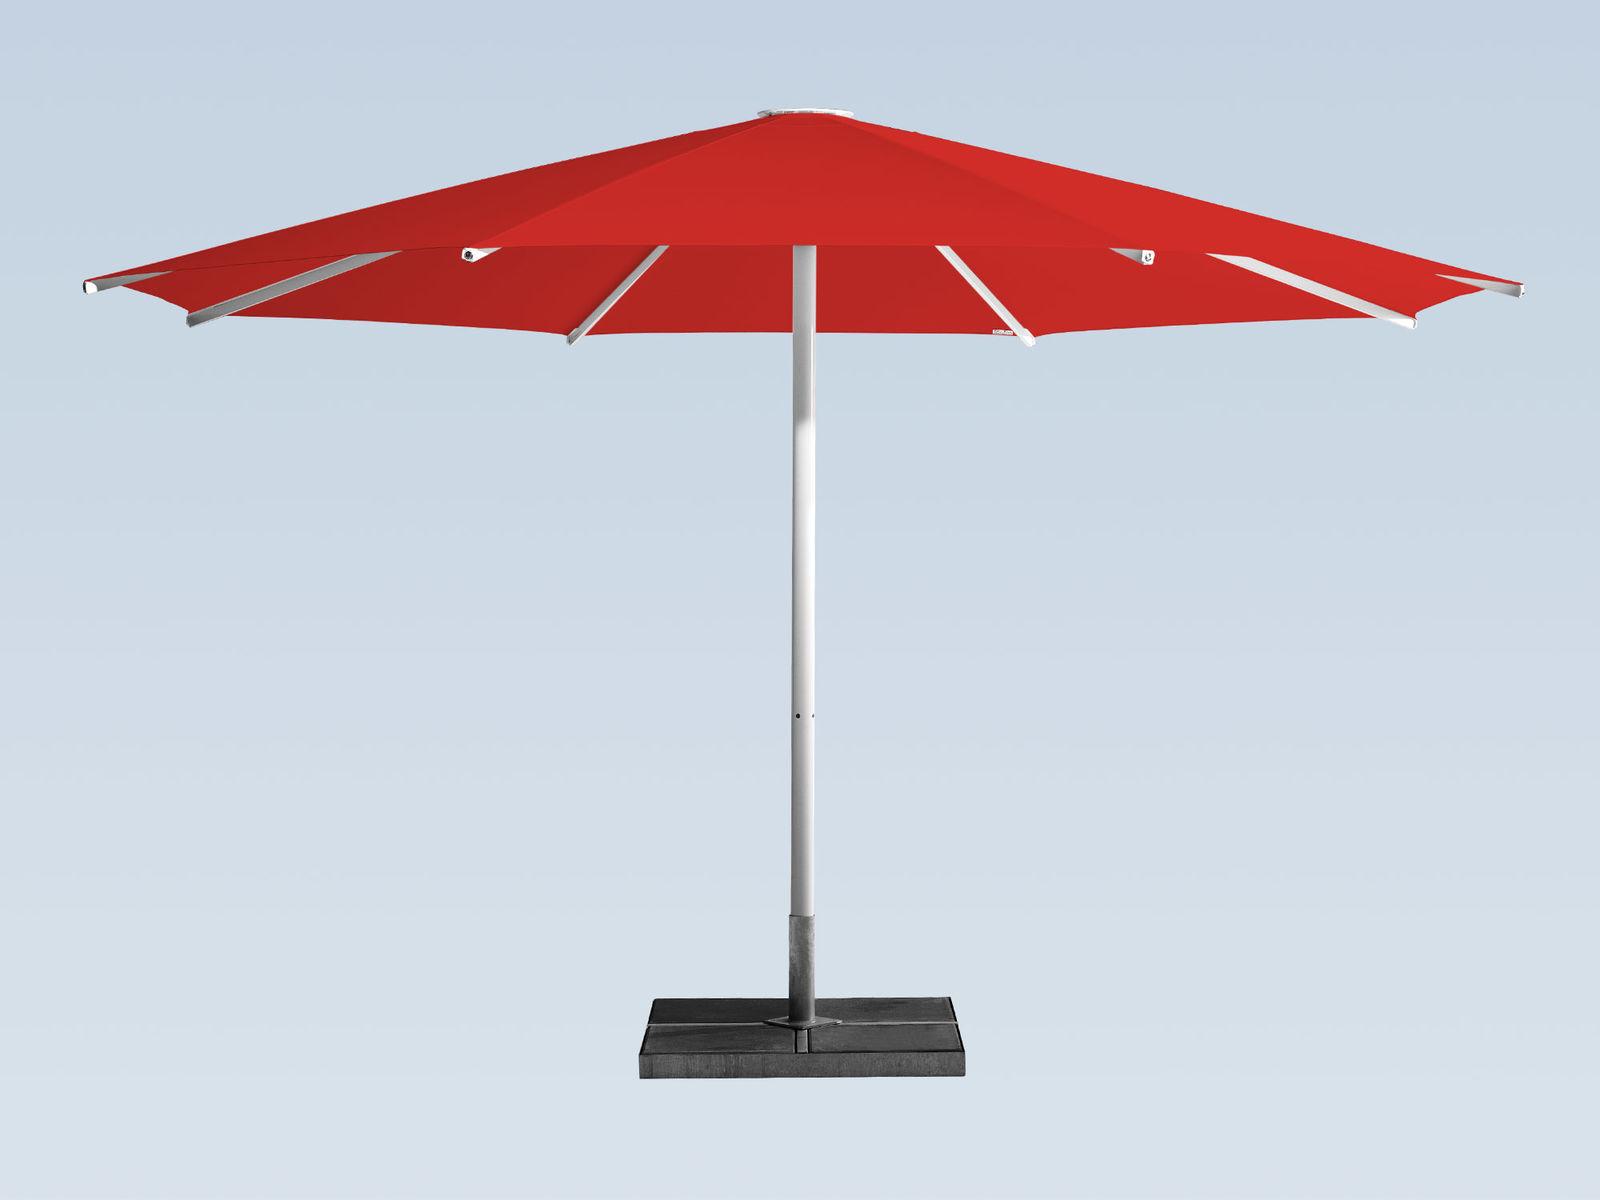 type t telescope umbrella mdt tex. Black Bedroom Furniture Sets. Home Design Ideas